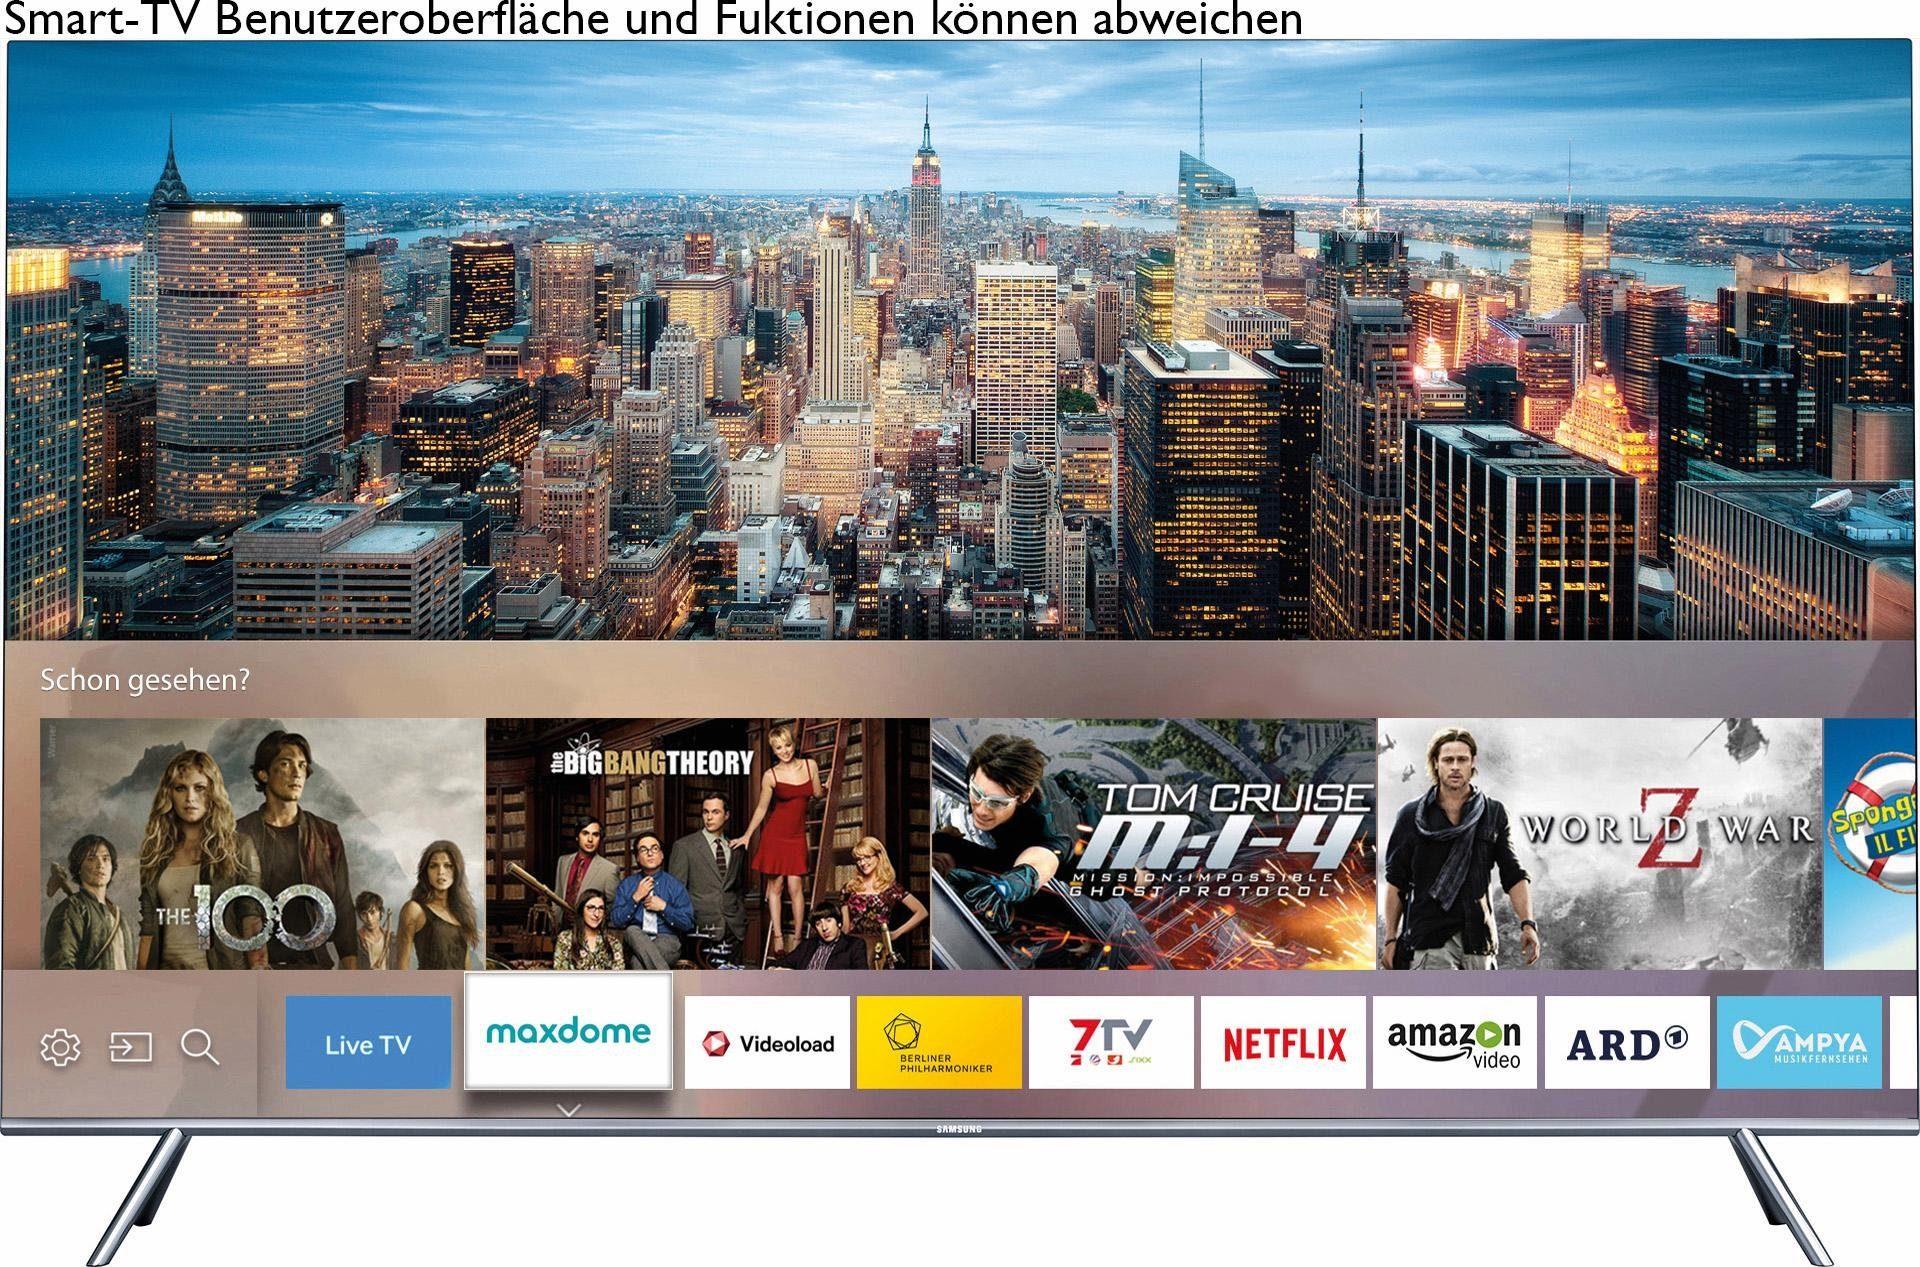 Samsung UE43KS7590UXZG, Curved-LED-Fernseher, 108 cm (43 Zoll), 2160p (SUHD), Smart-TV